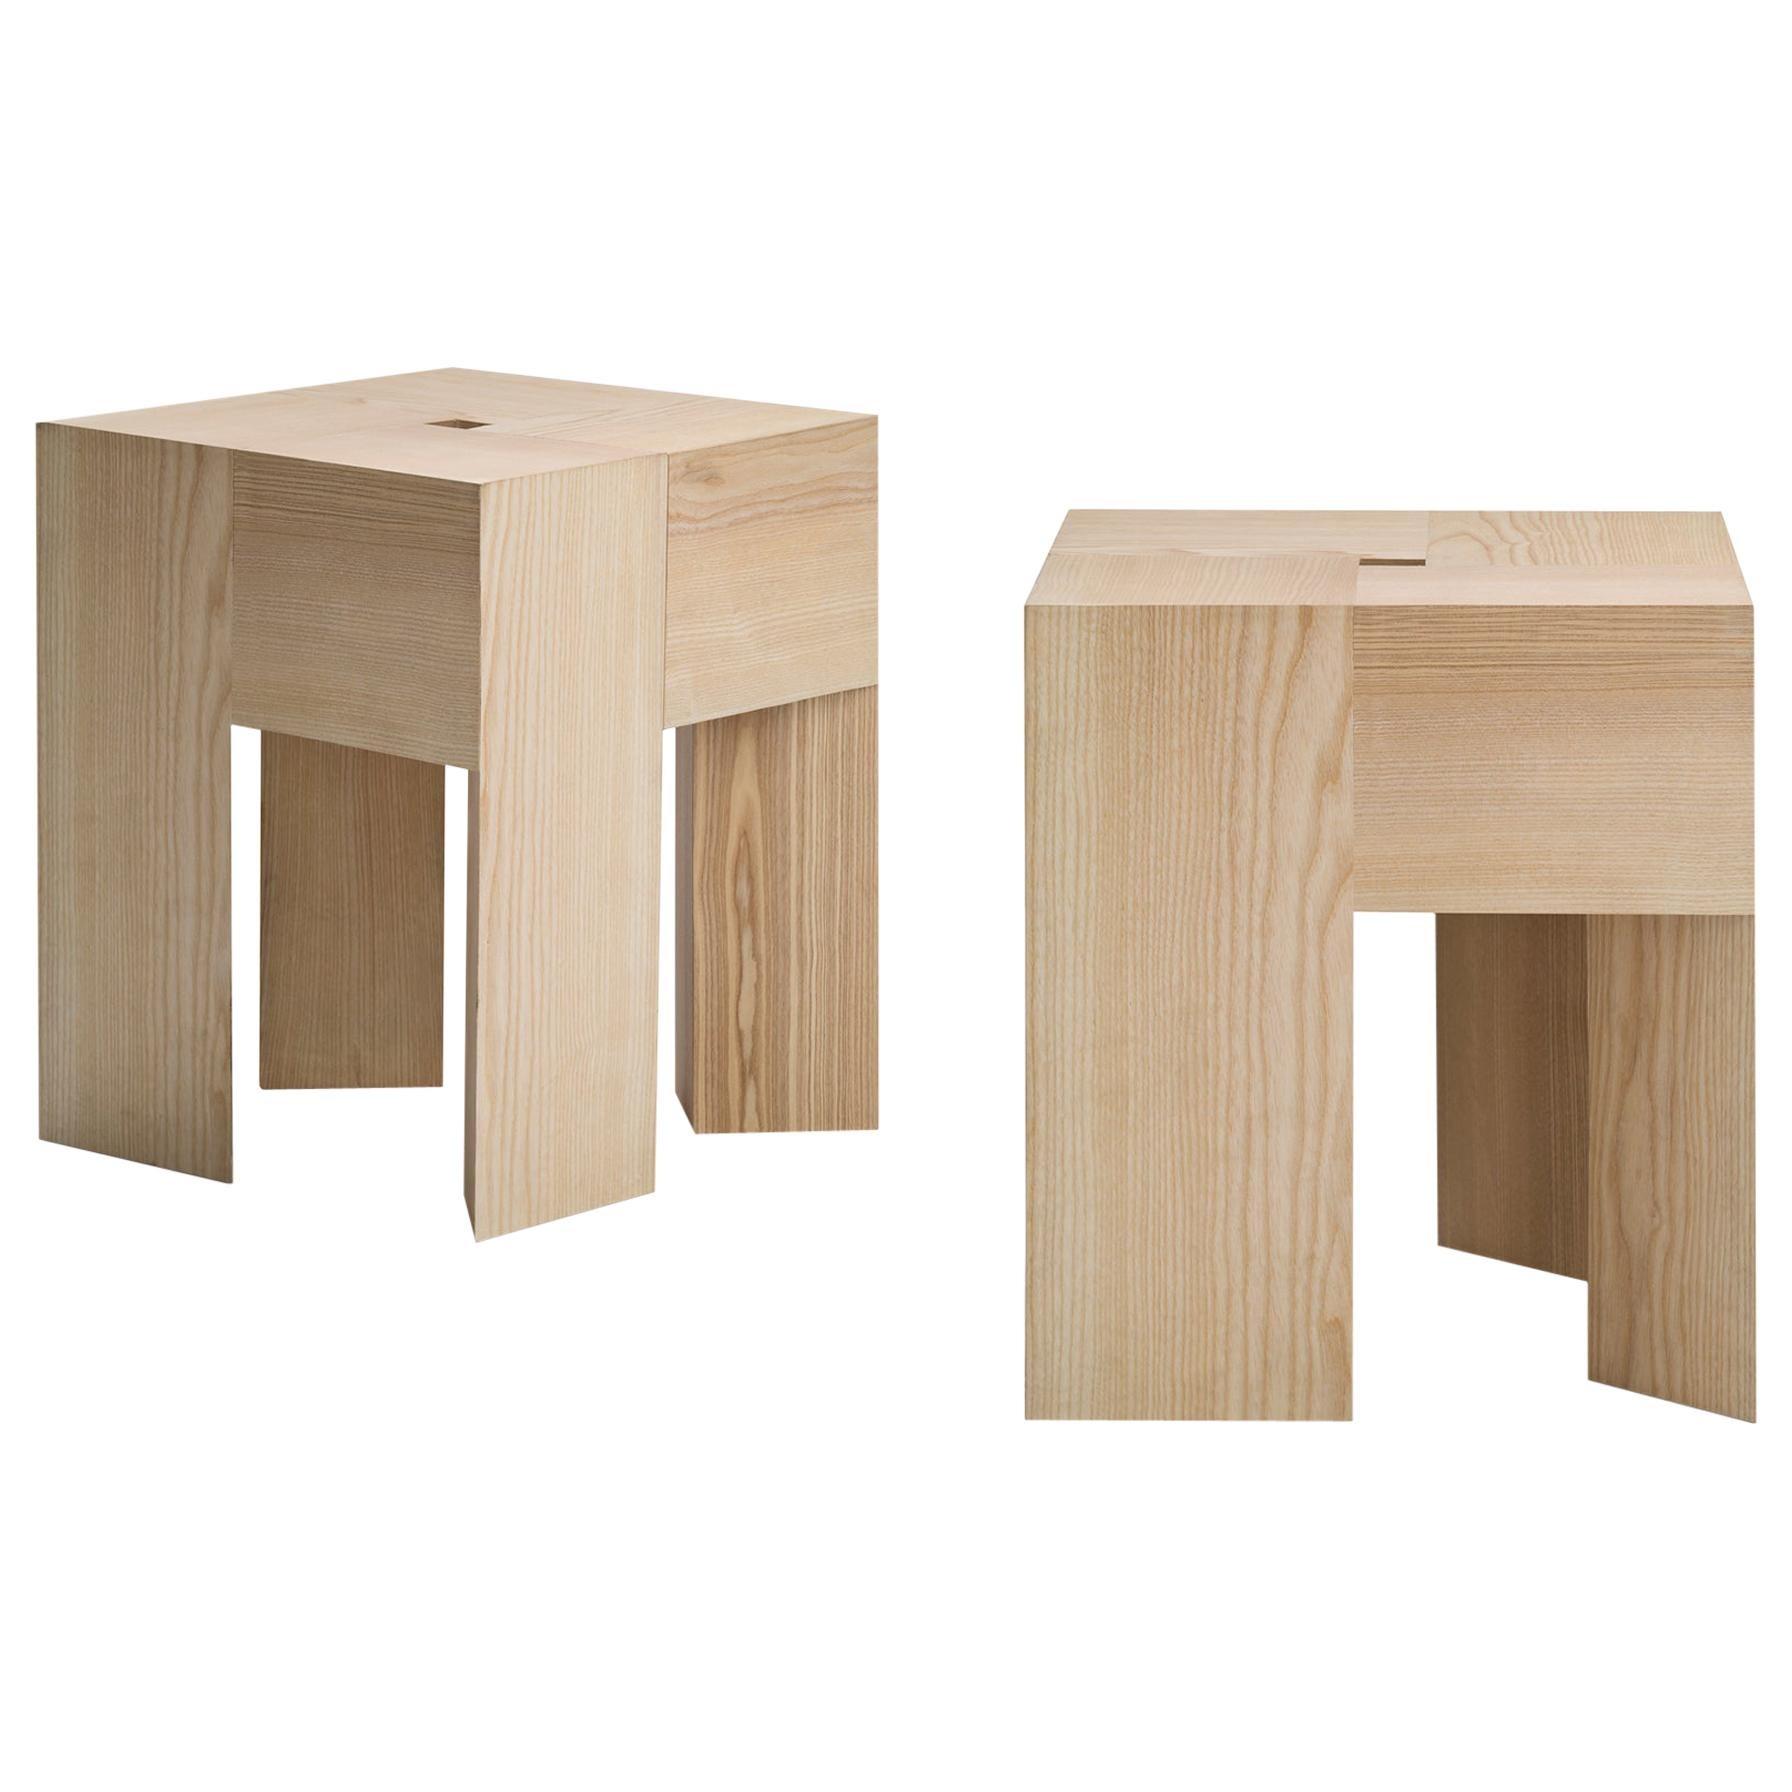 Set of Two Aldo Bakker 'Triangle' Wood Stools or Side Table